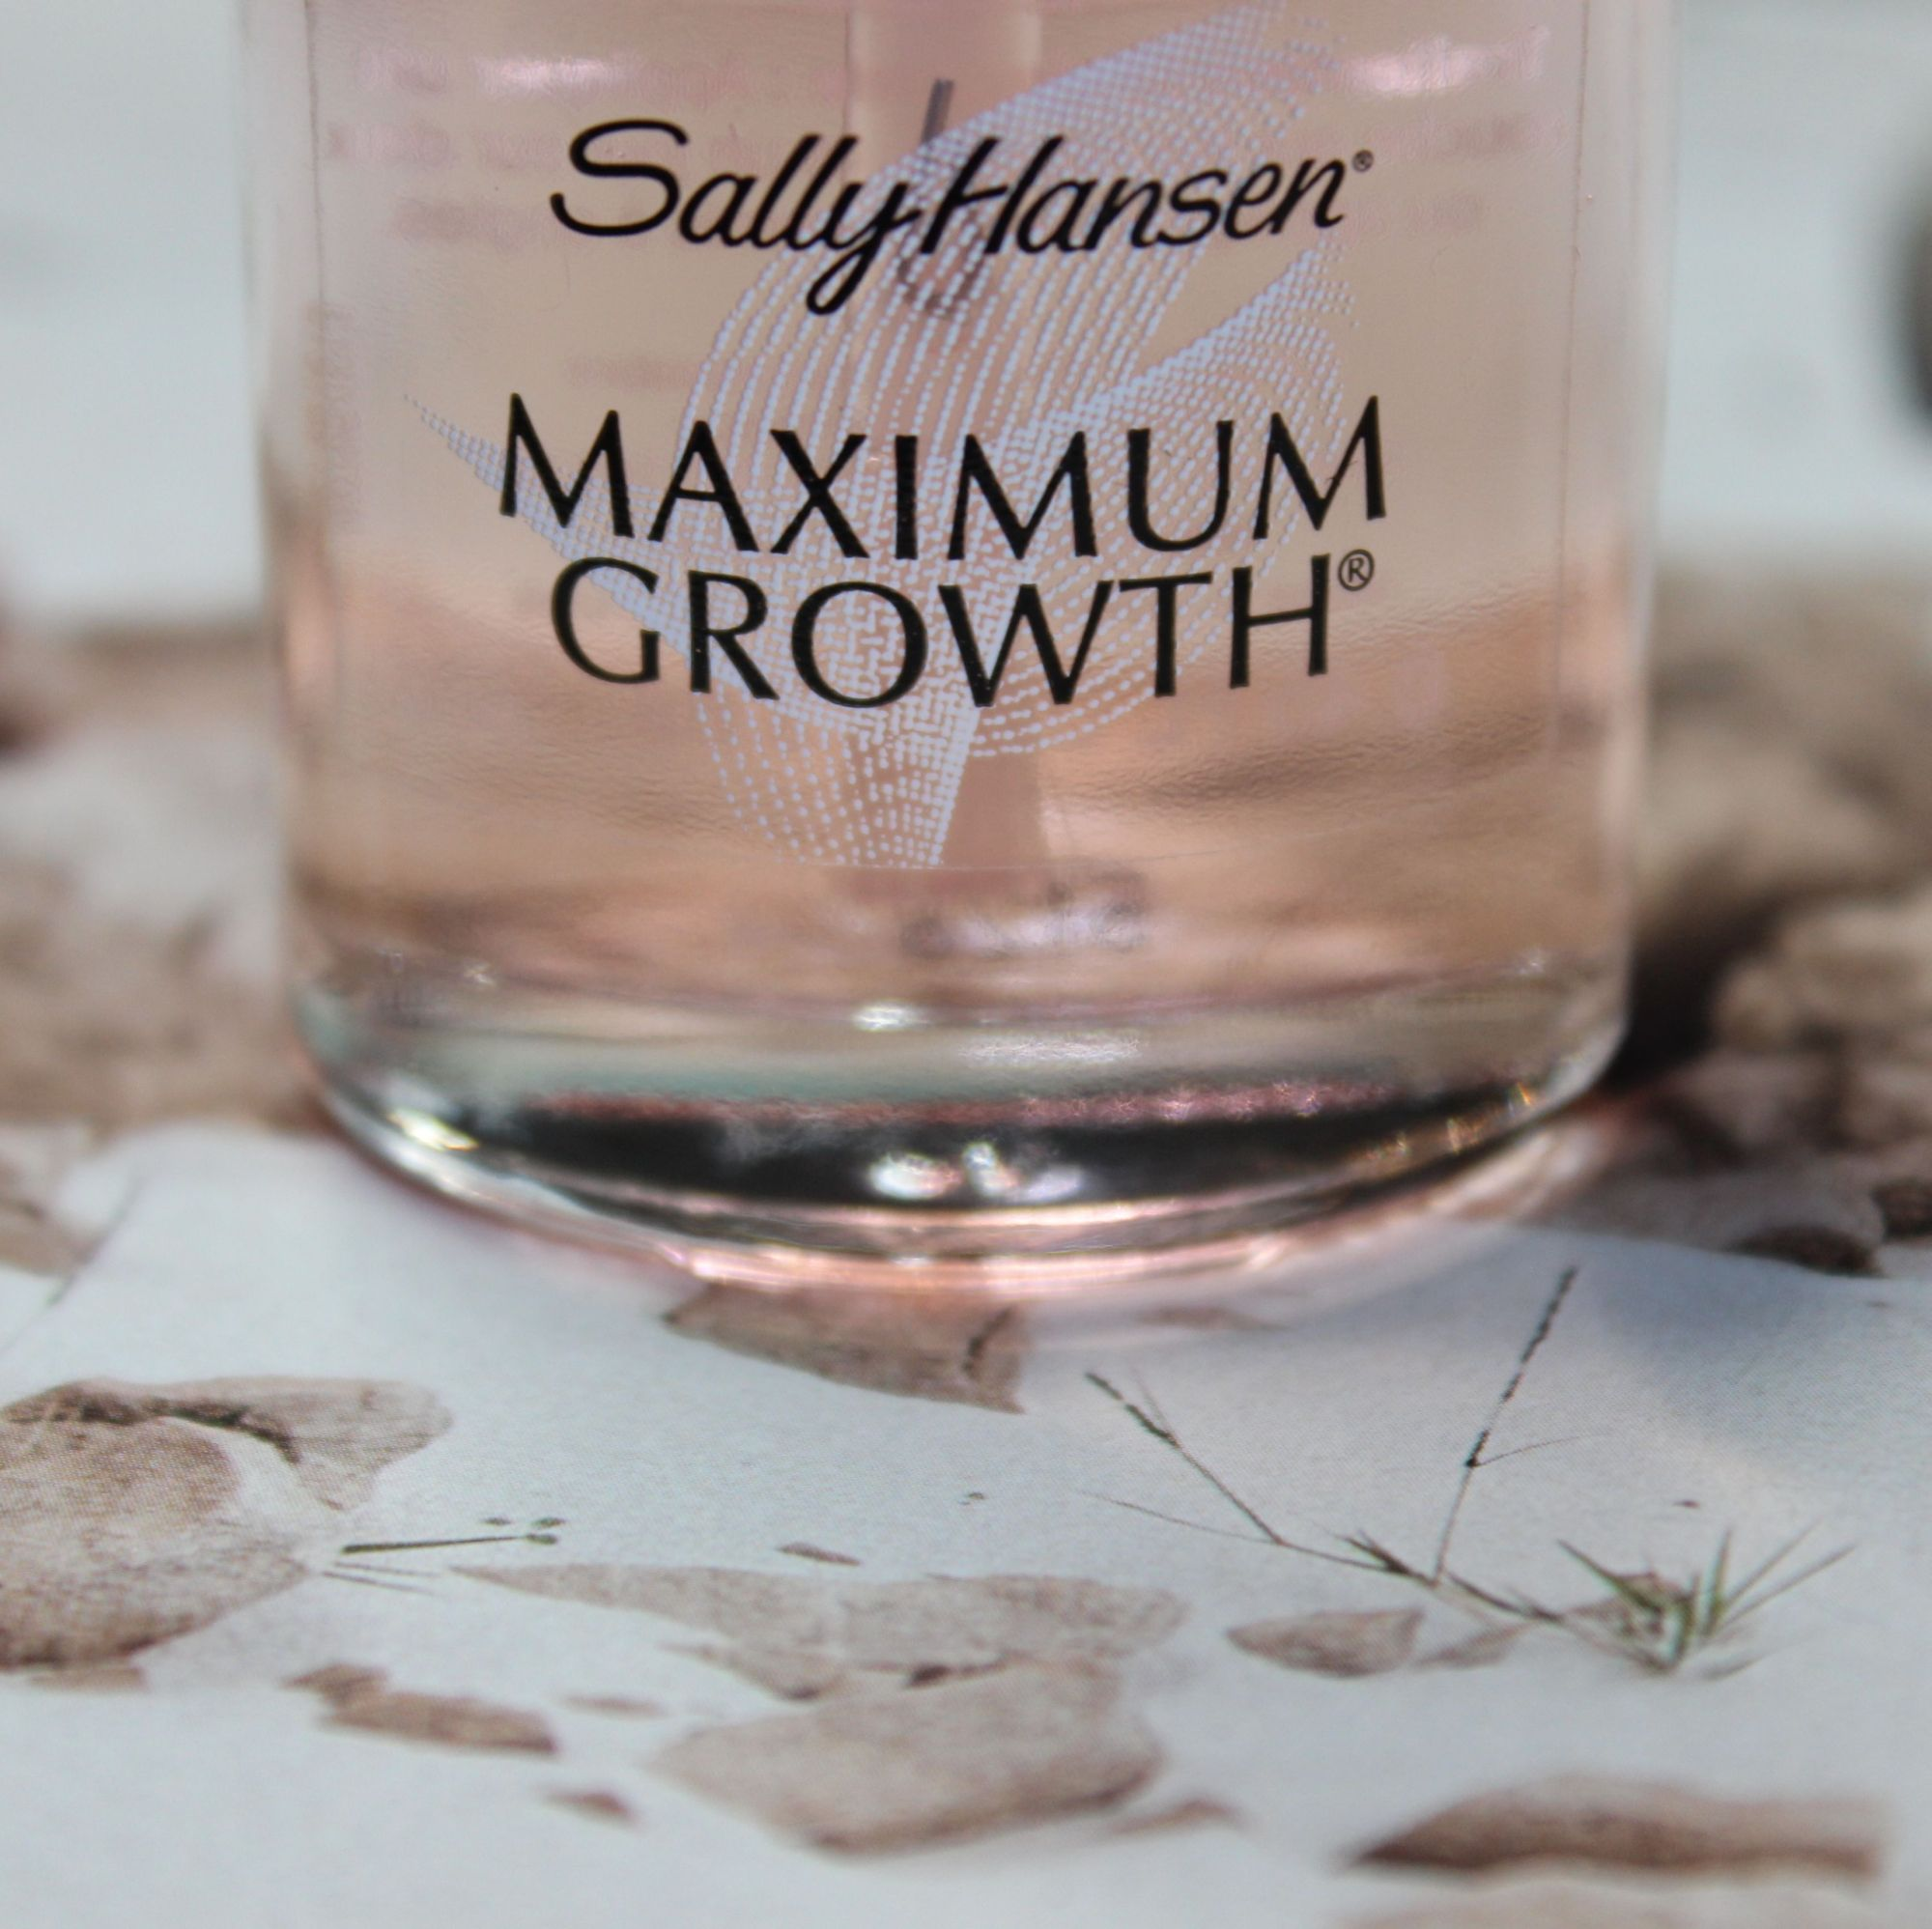 Sally Hansen Maximum Growth 2